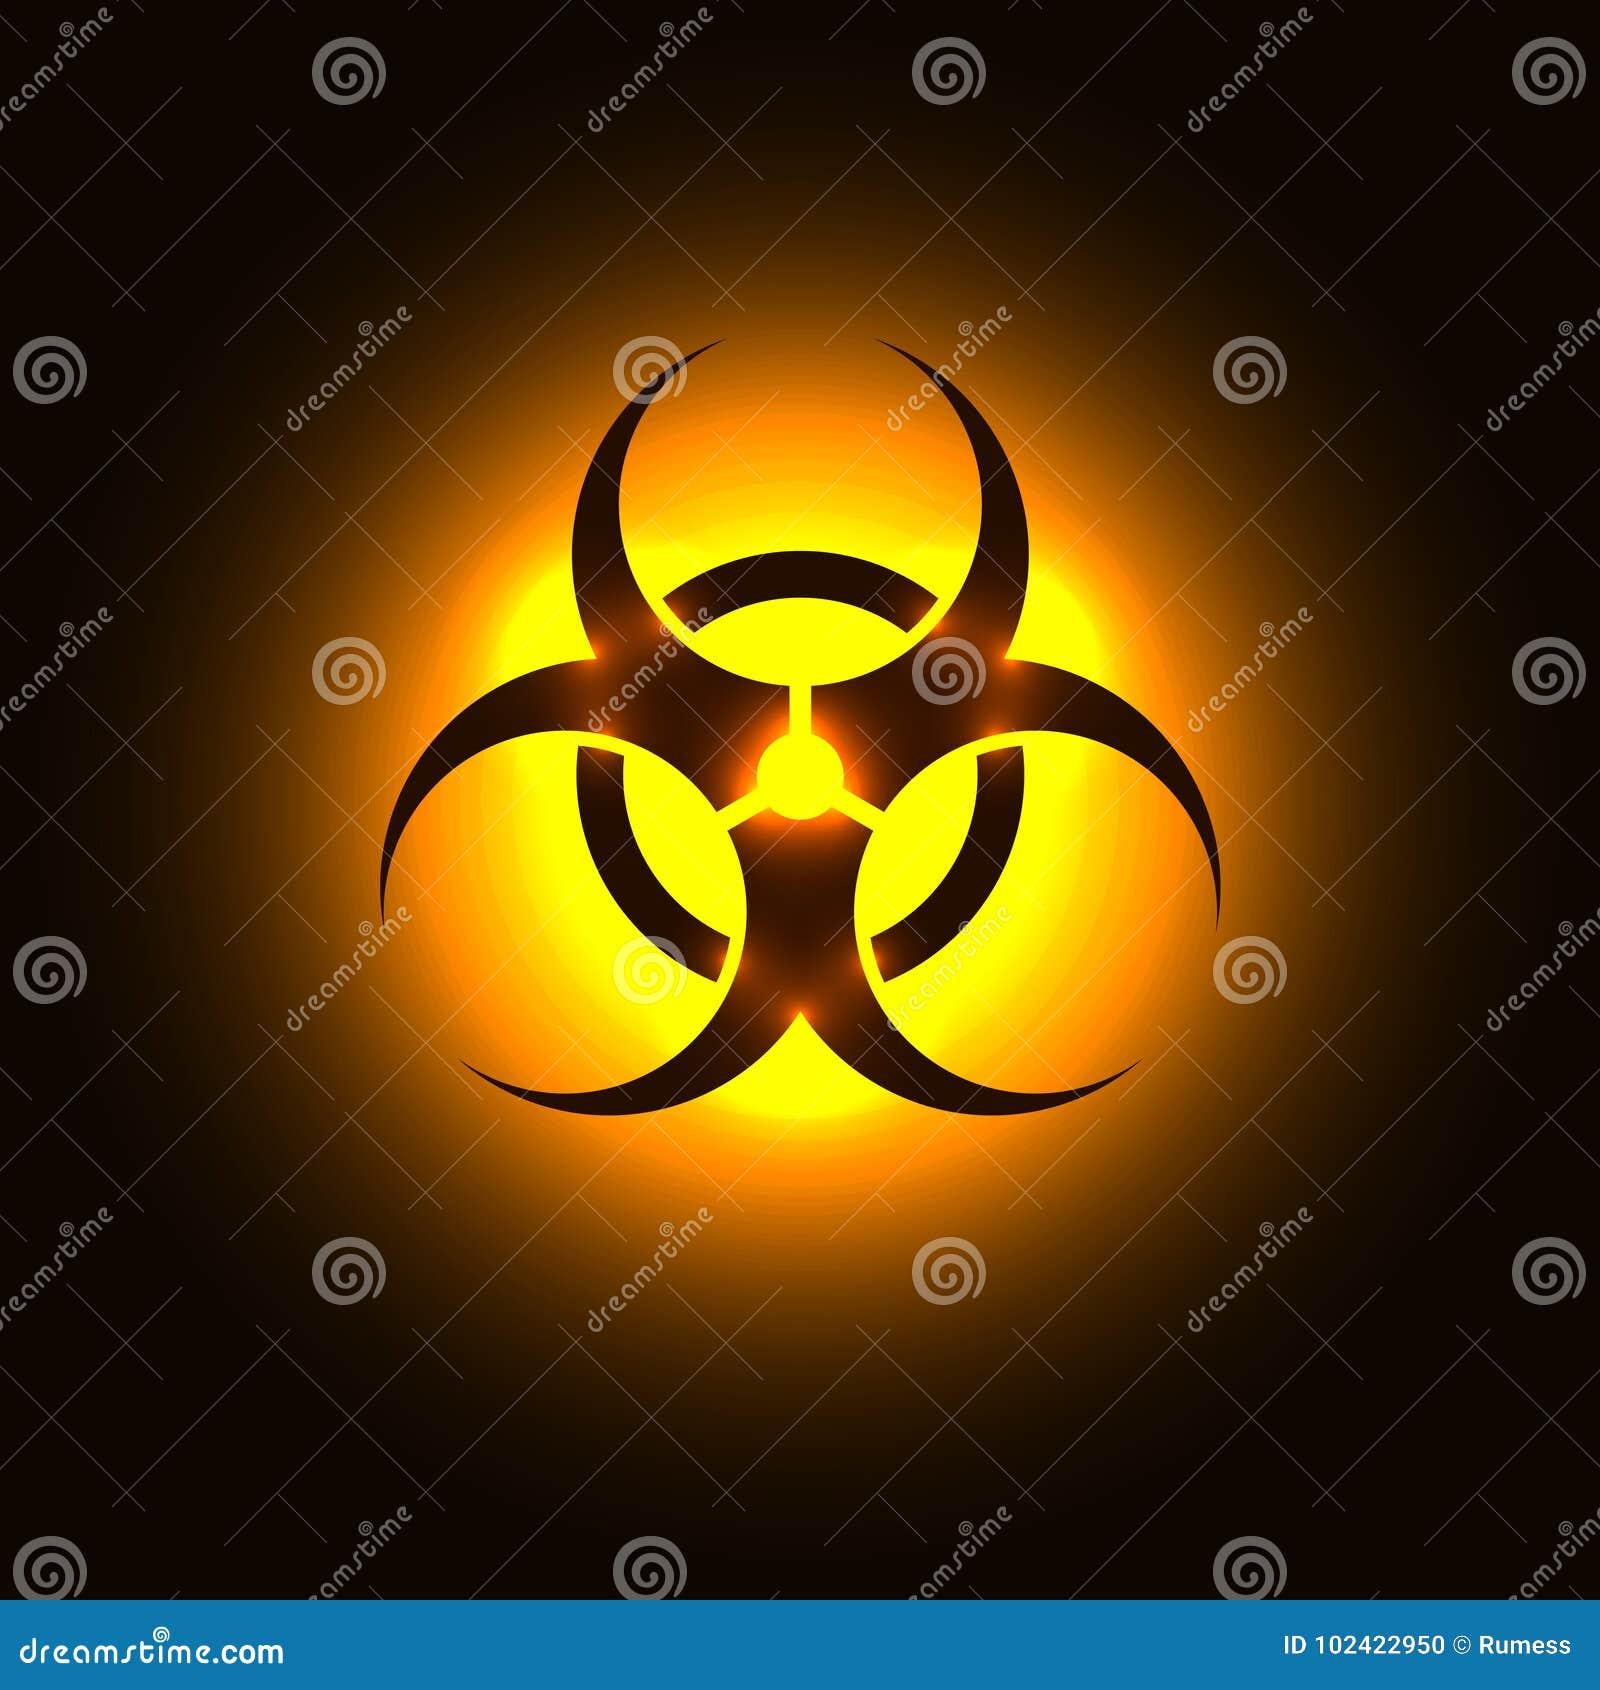 Biohazard Symbol On Orange Glowing Background Stock Vector